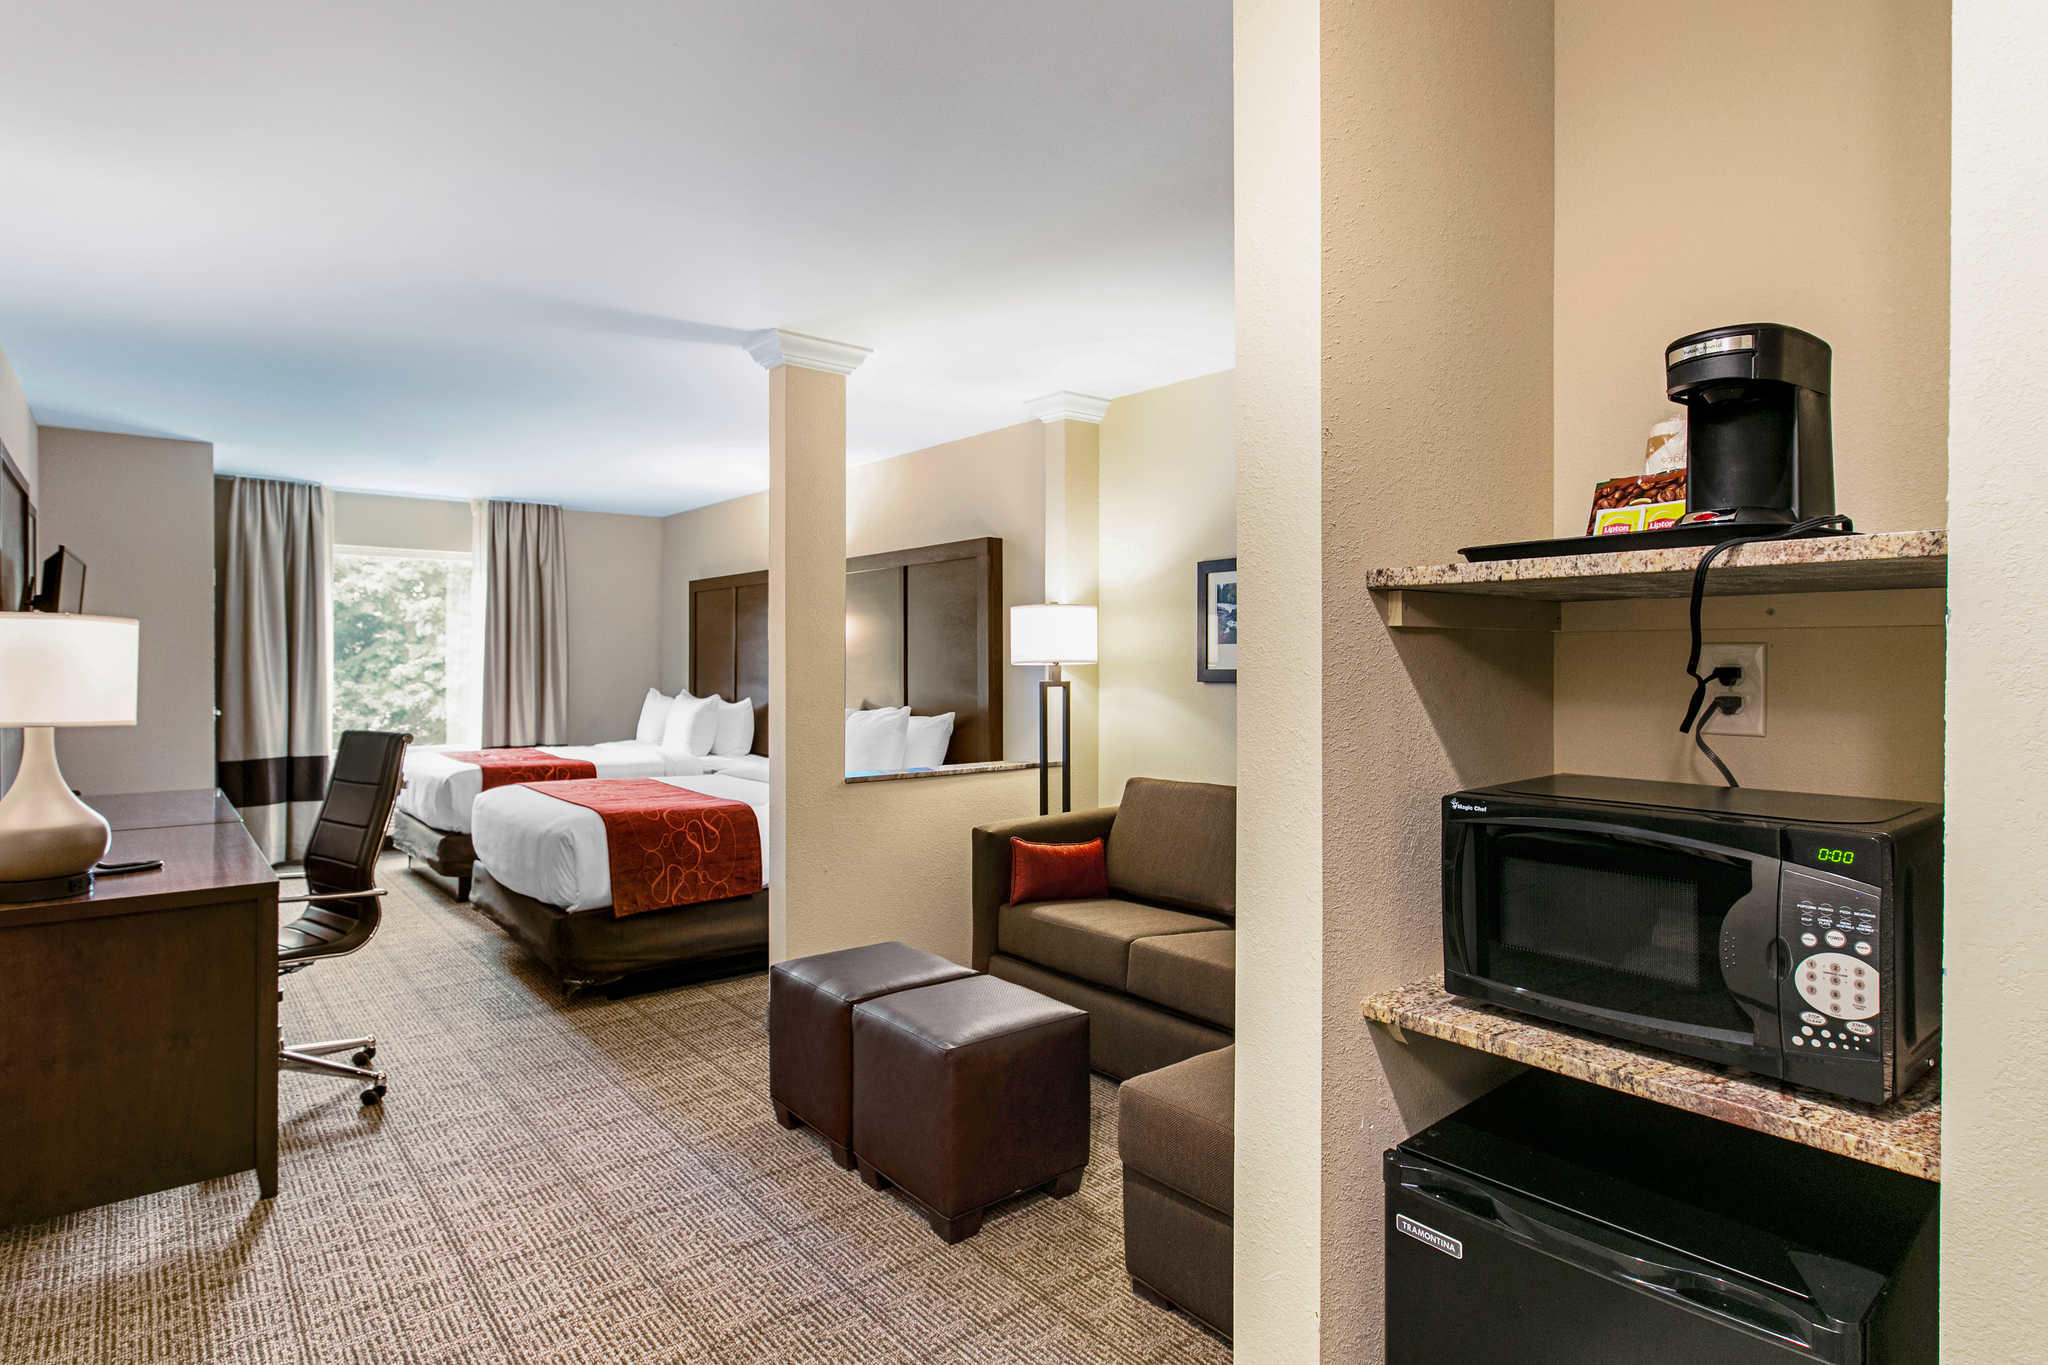 Comfort Suites image 27